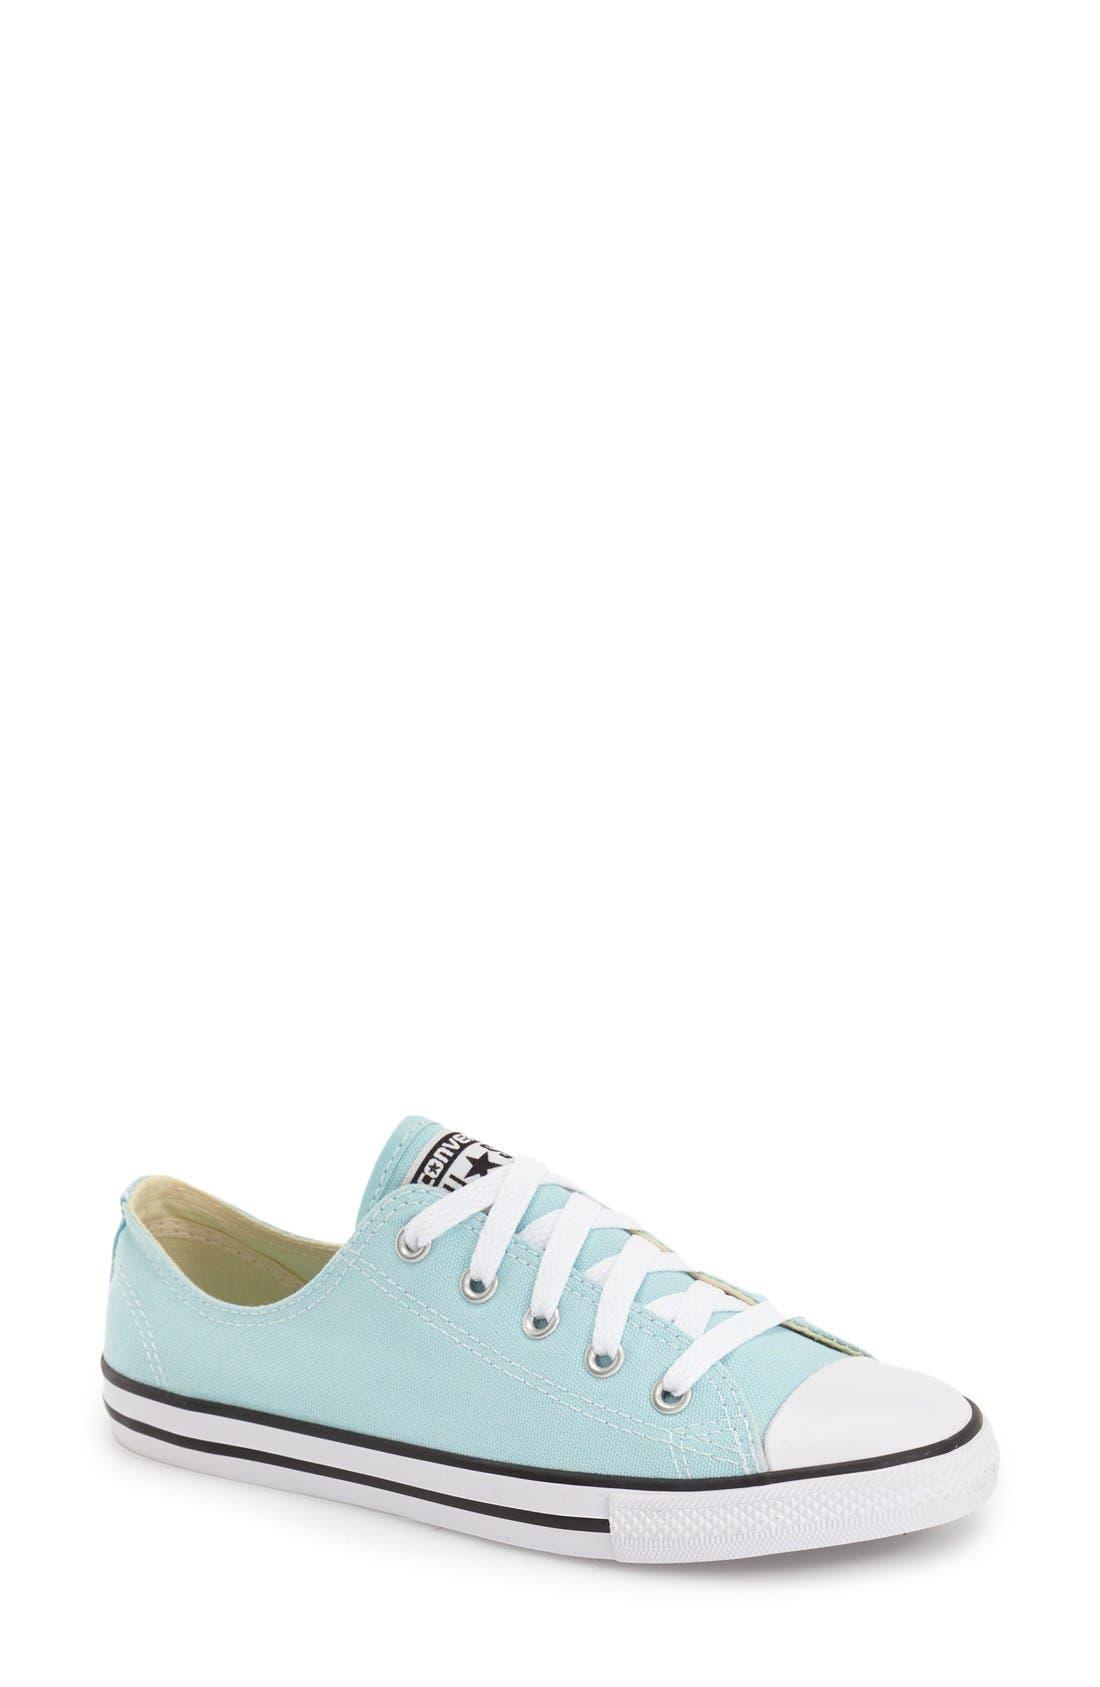 Main Image - Converse 'Seasonal Dainty' Chuck Taylor® All Star® Low Top Sneaker (Women)